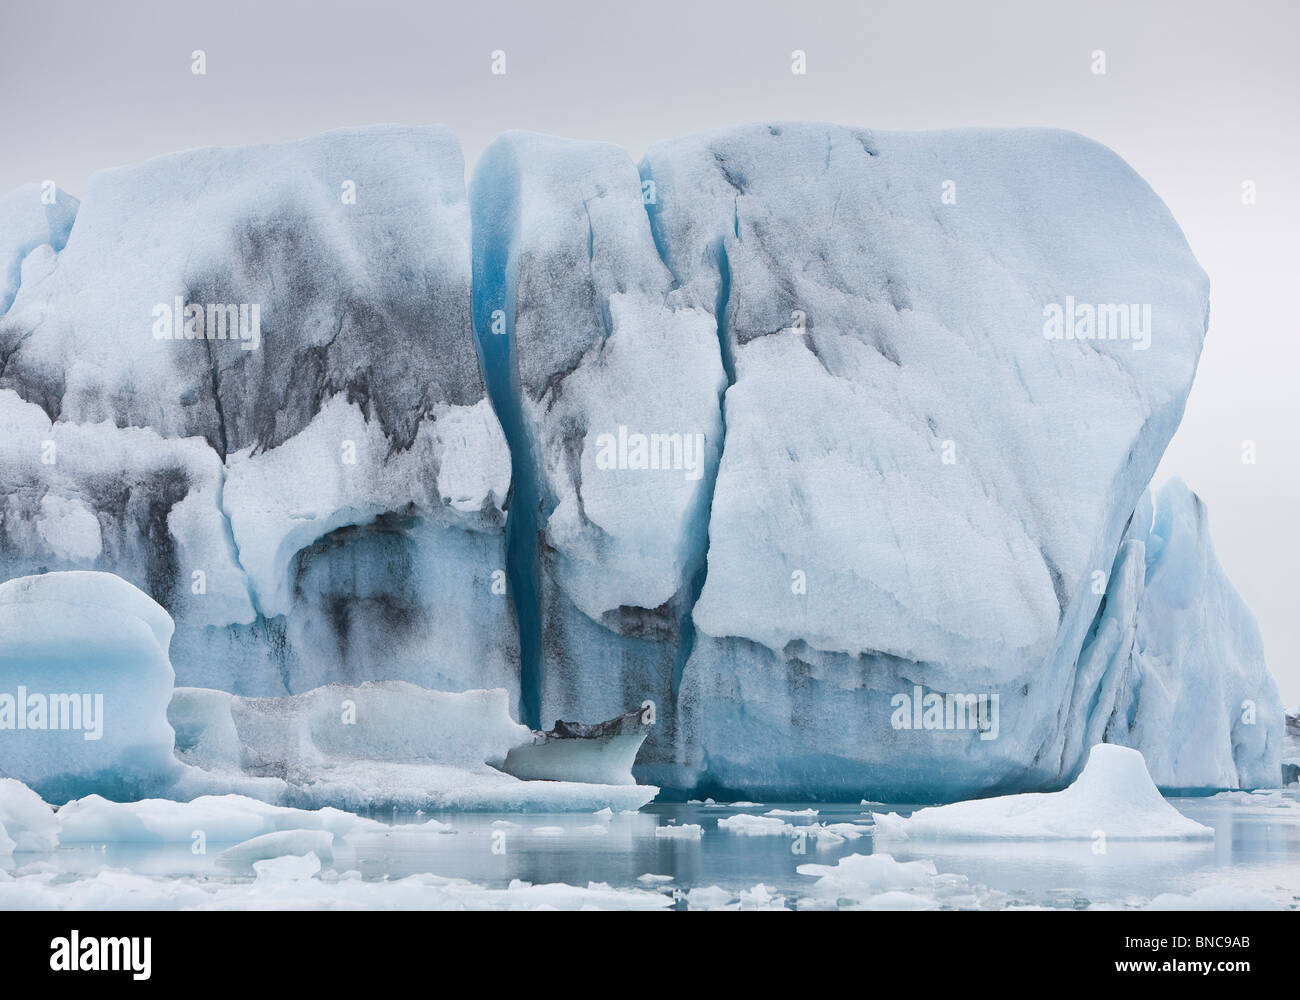 Eisberge in der Gletscherlagune Jökulsárlón, Breidamerkurjokull Gletscher, Vatnajökull-Eiskappe, Stockbild